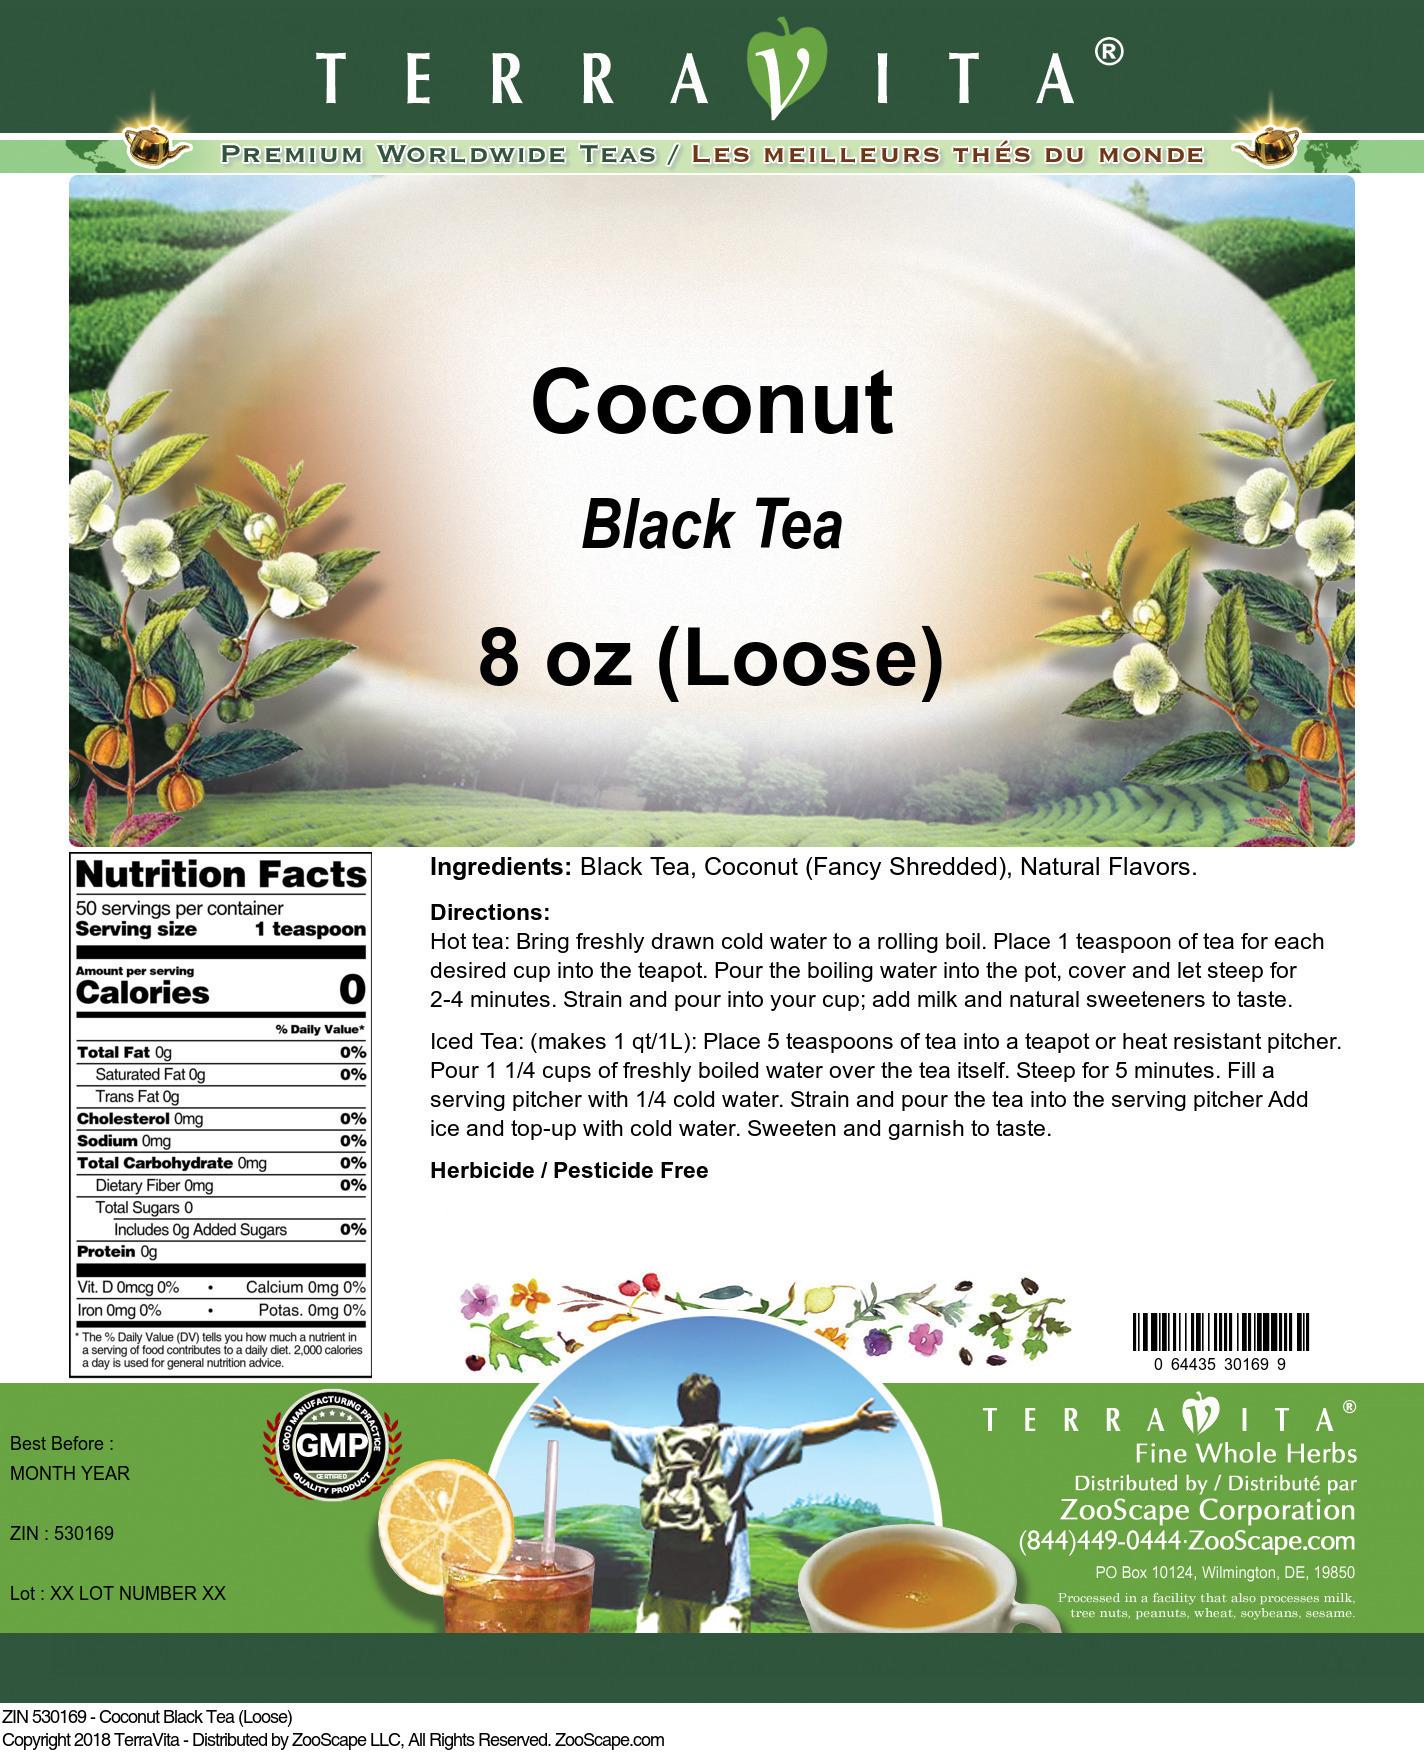 Coconut Black Tea (Loose)